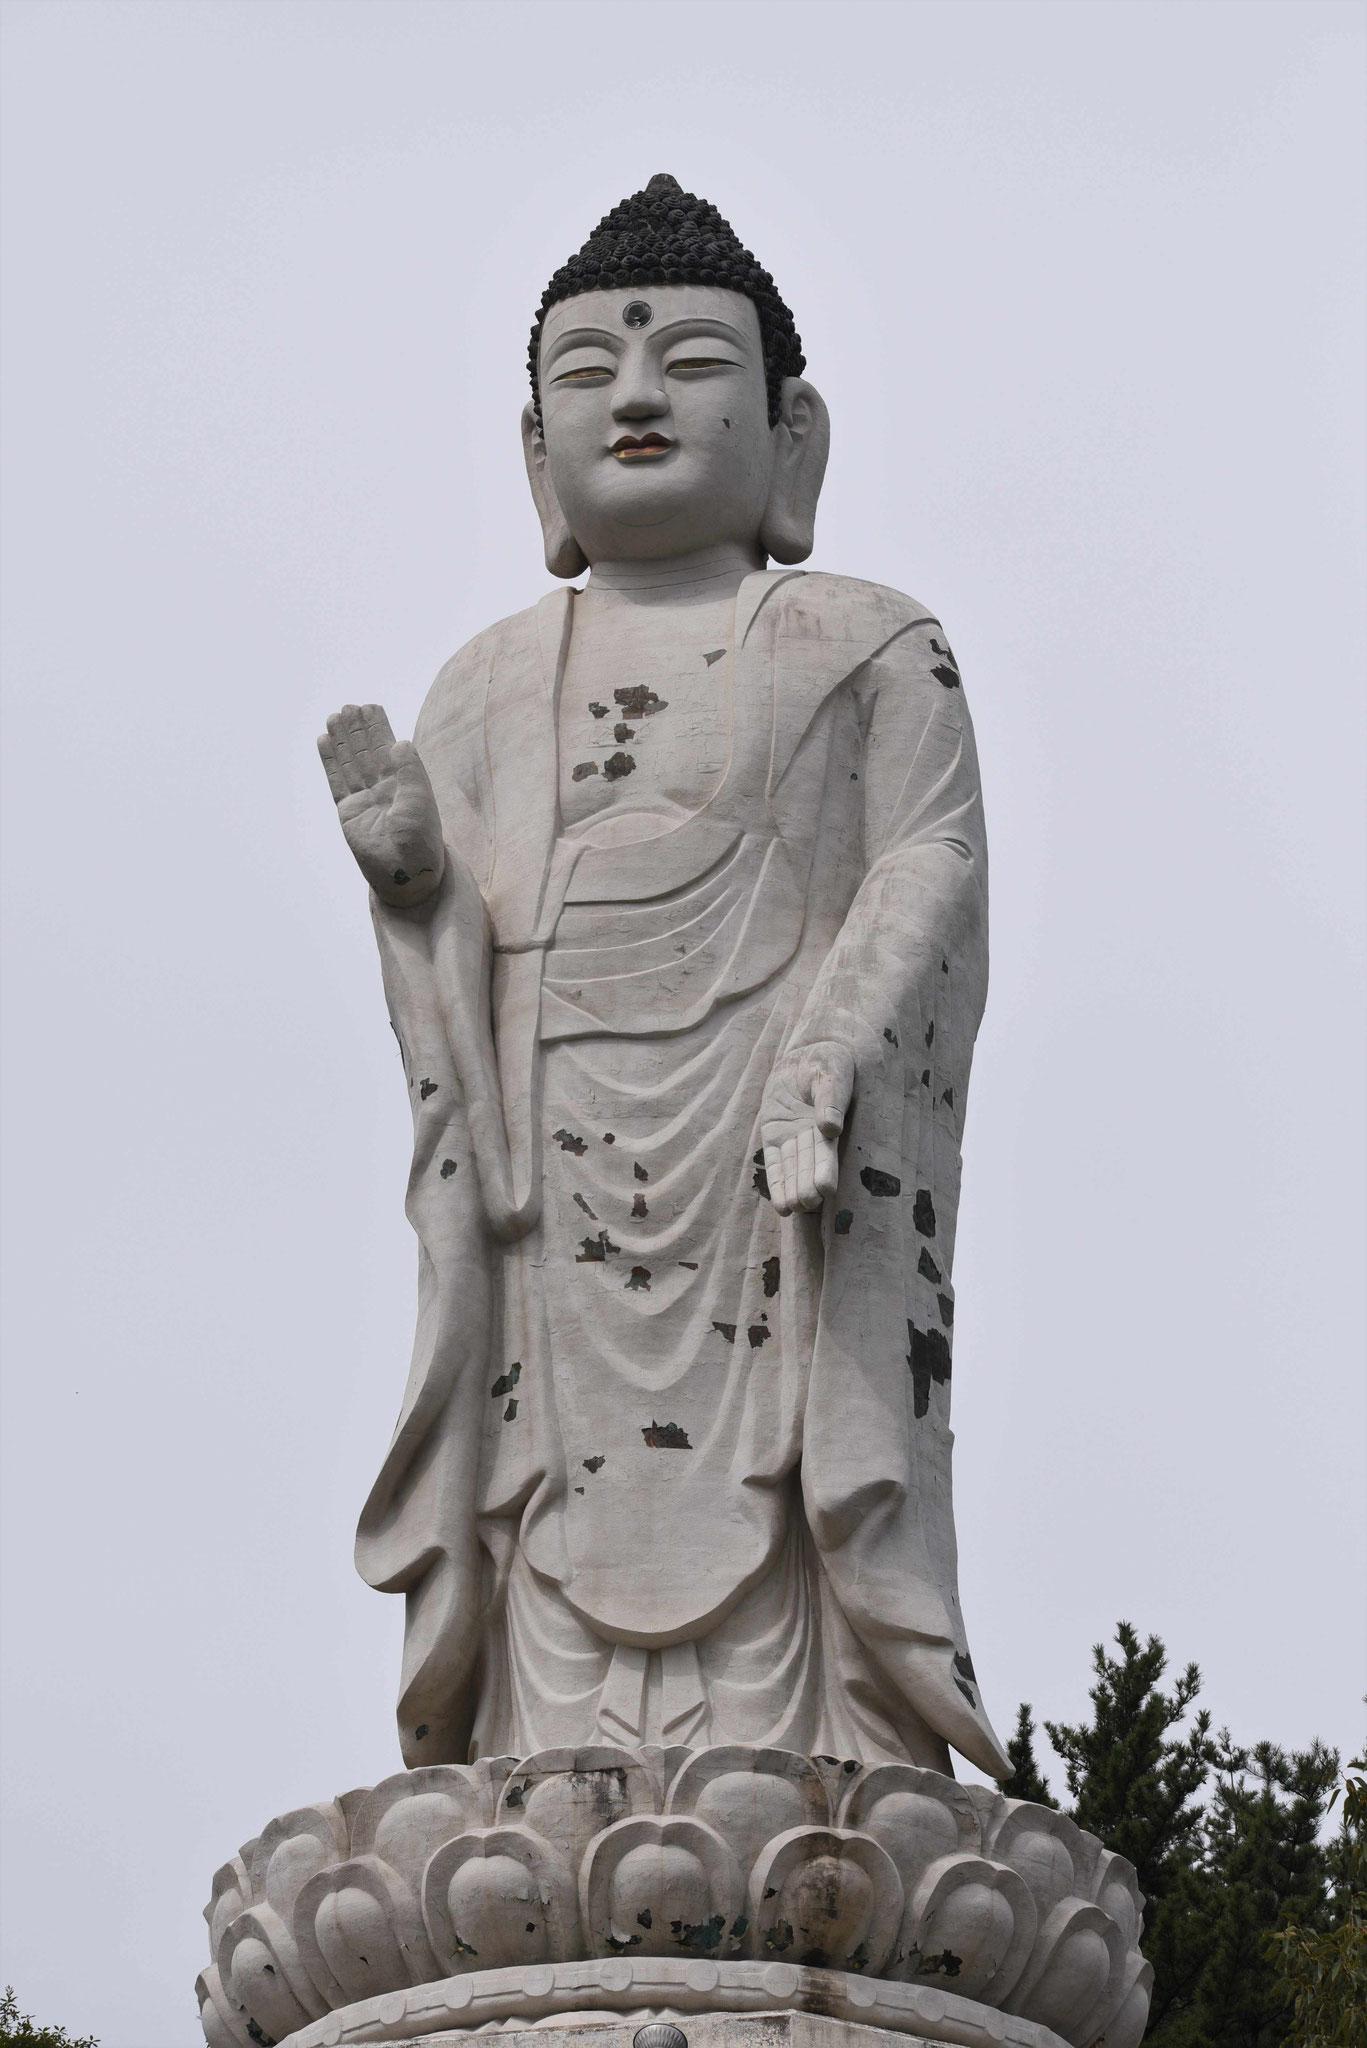 Überlebensgroße Buddastatue